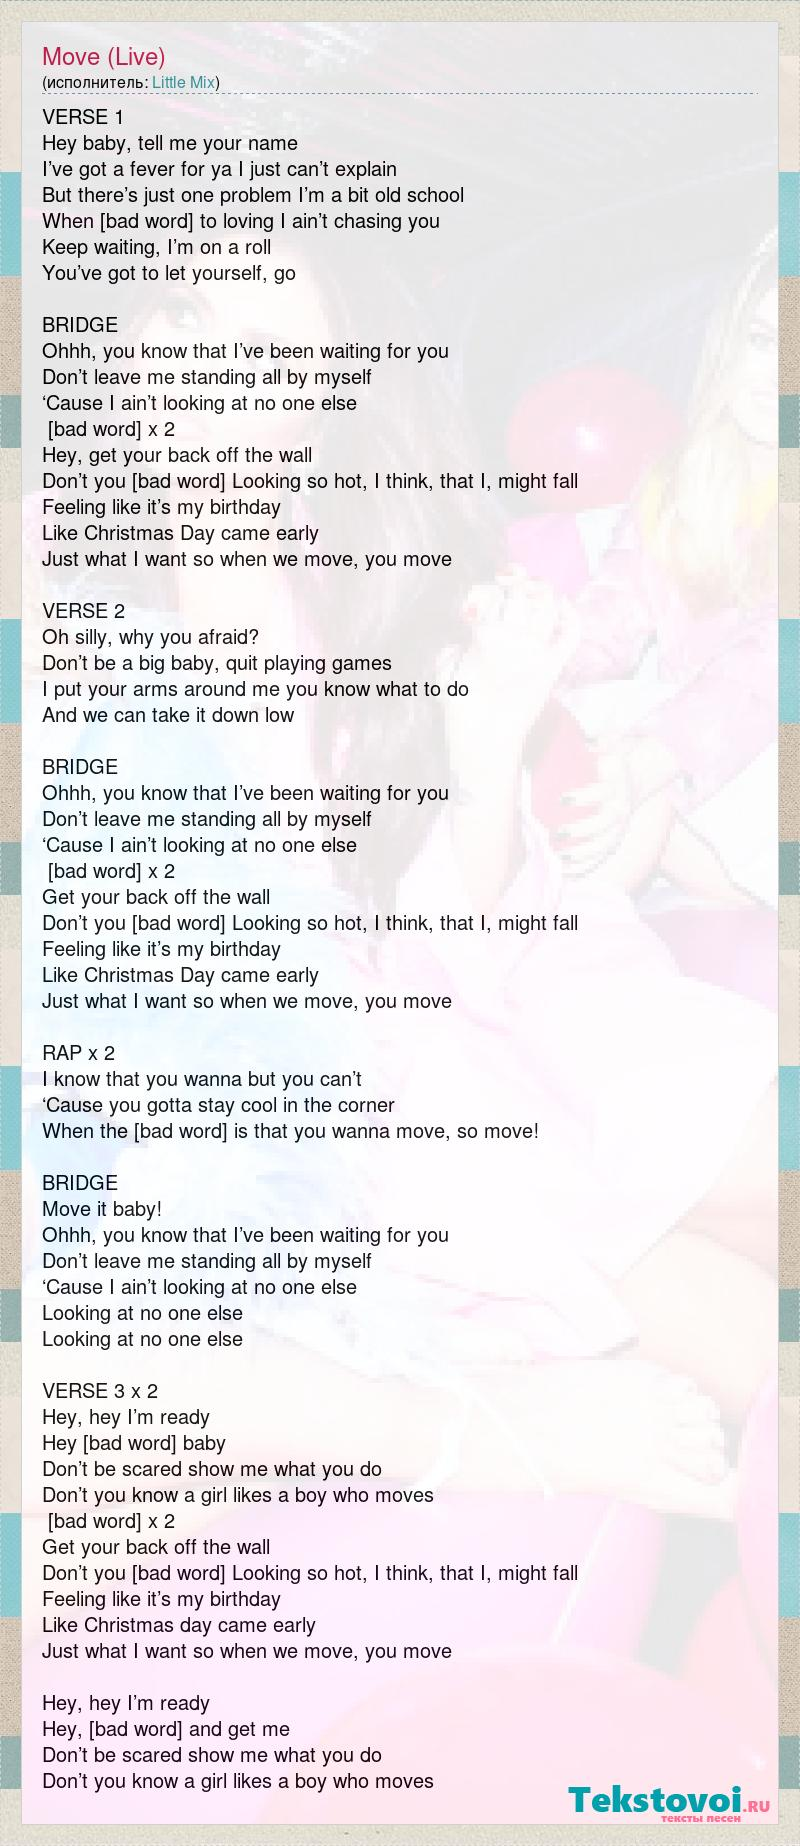 Little Mix: Move (Live) слова песни